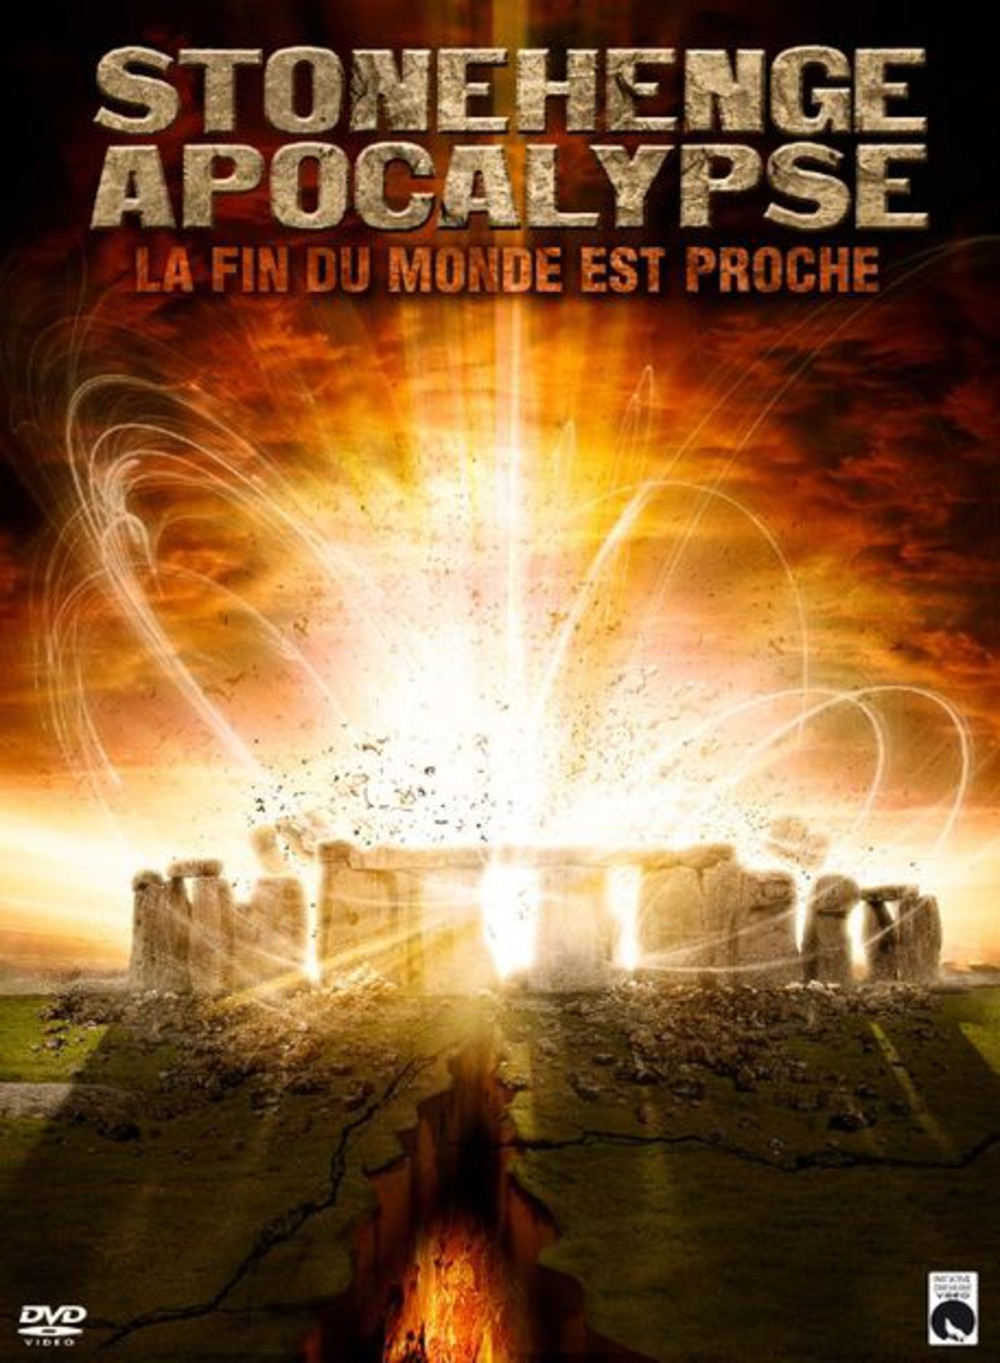 affiche du film Stonehenge Apocalypse (TV)